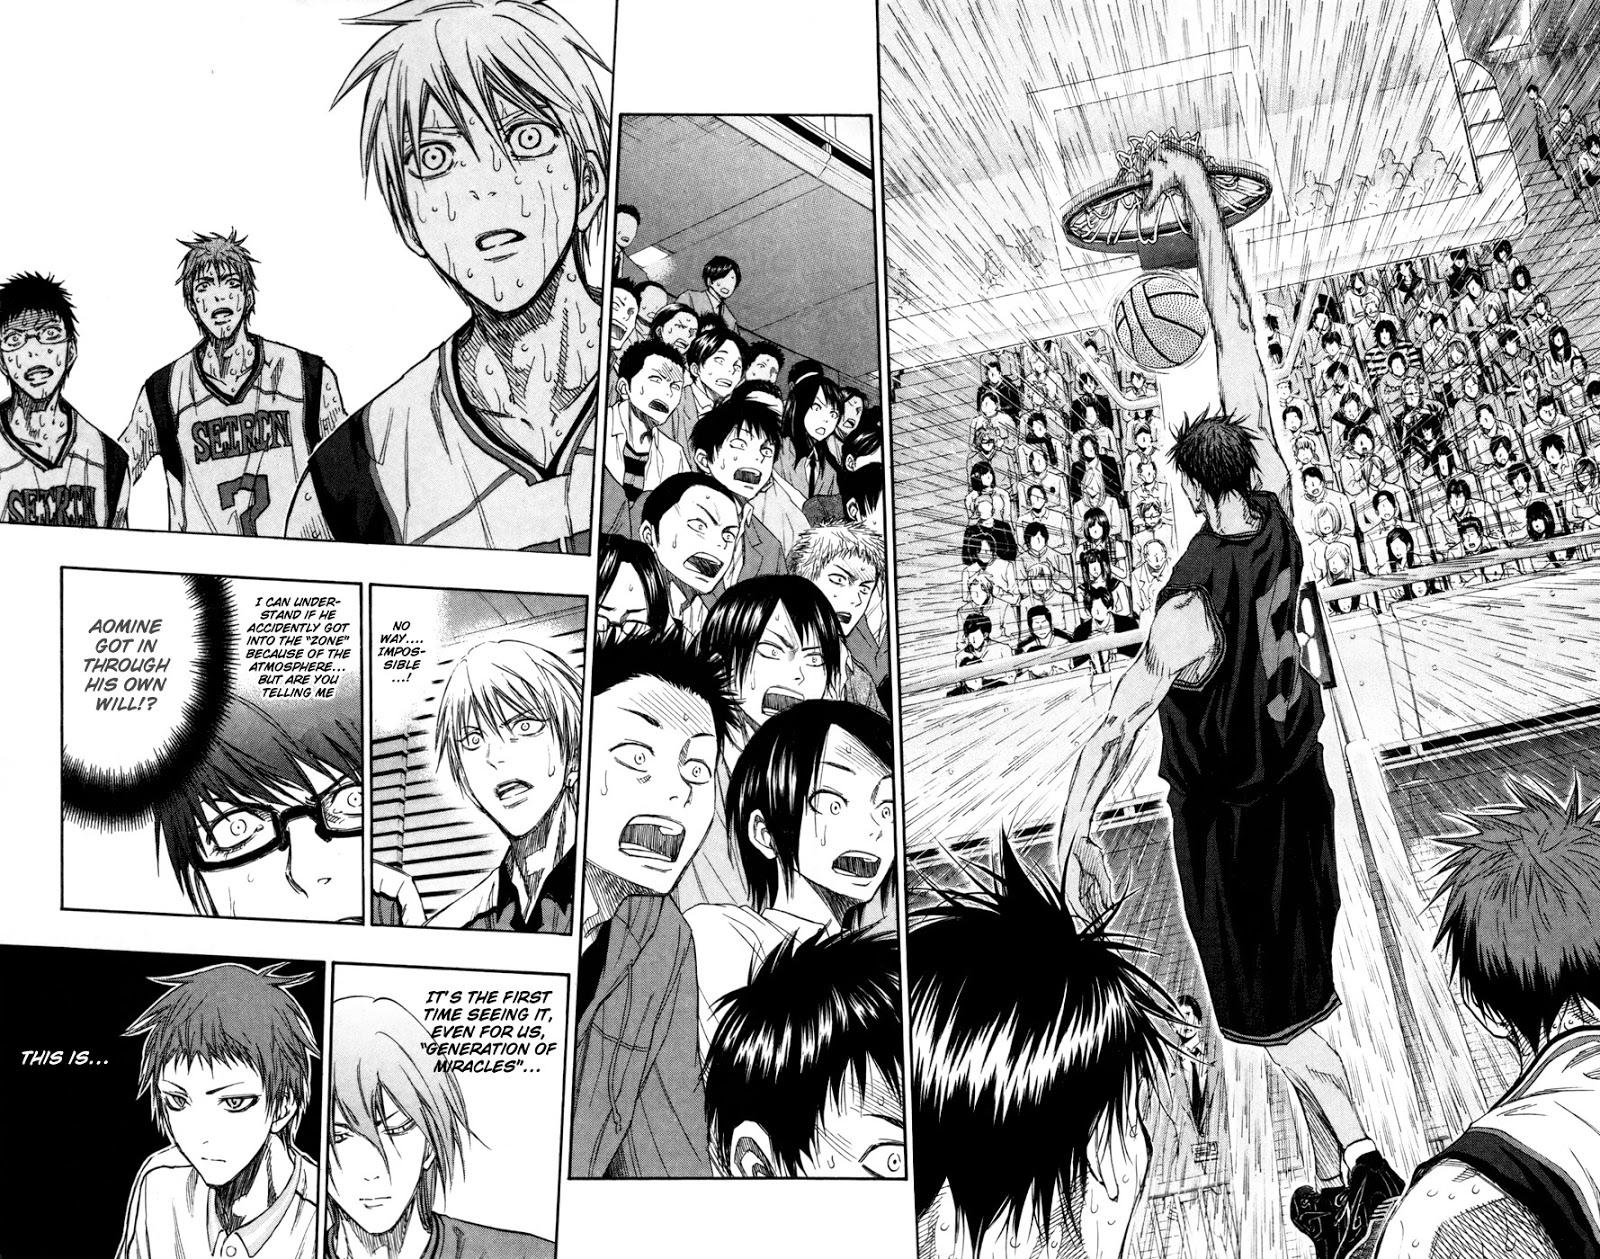 Kuroko no Basket Manga Chapter 134 - Image 04-05